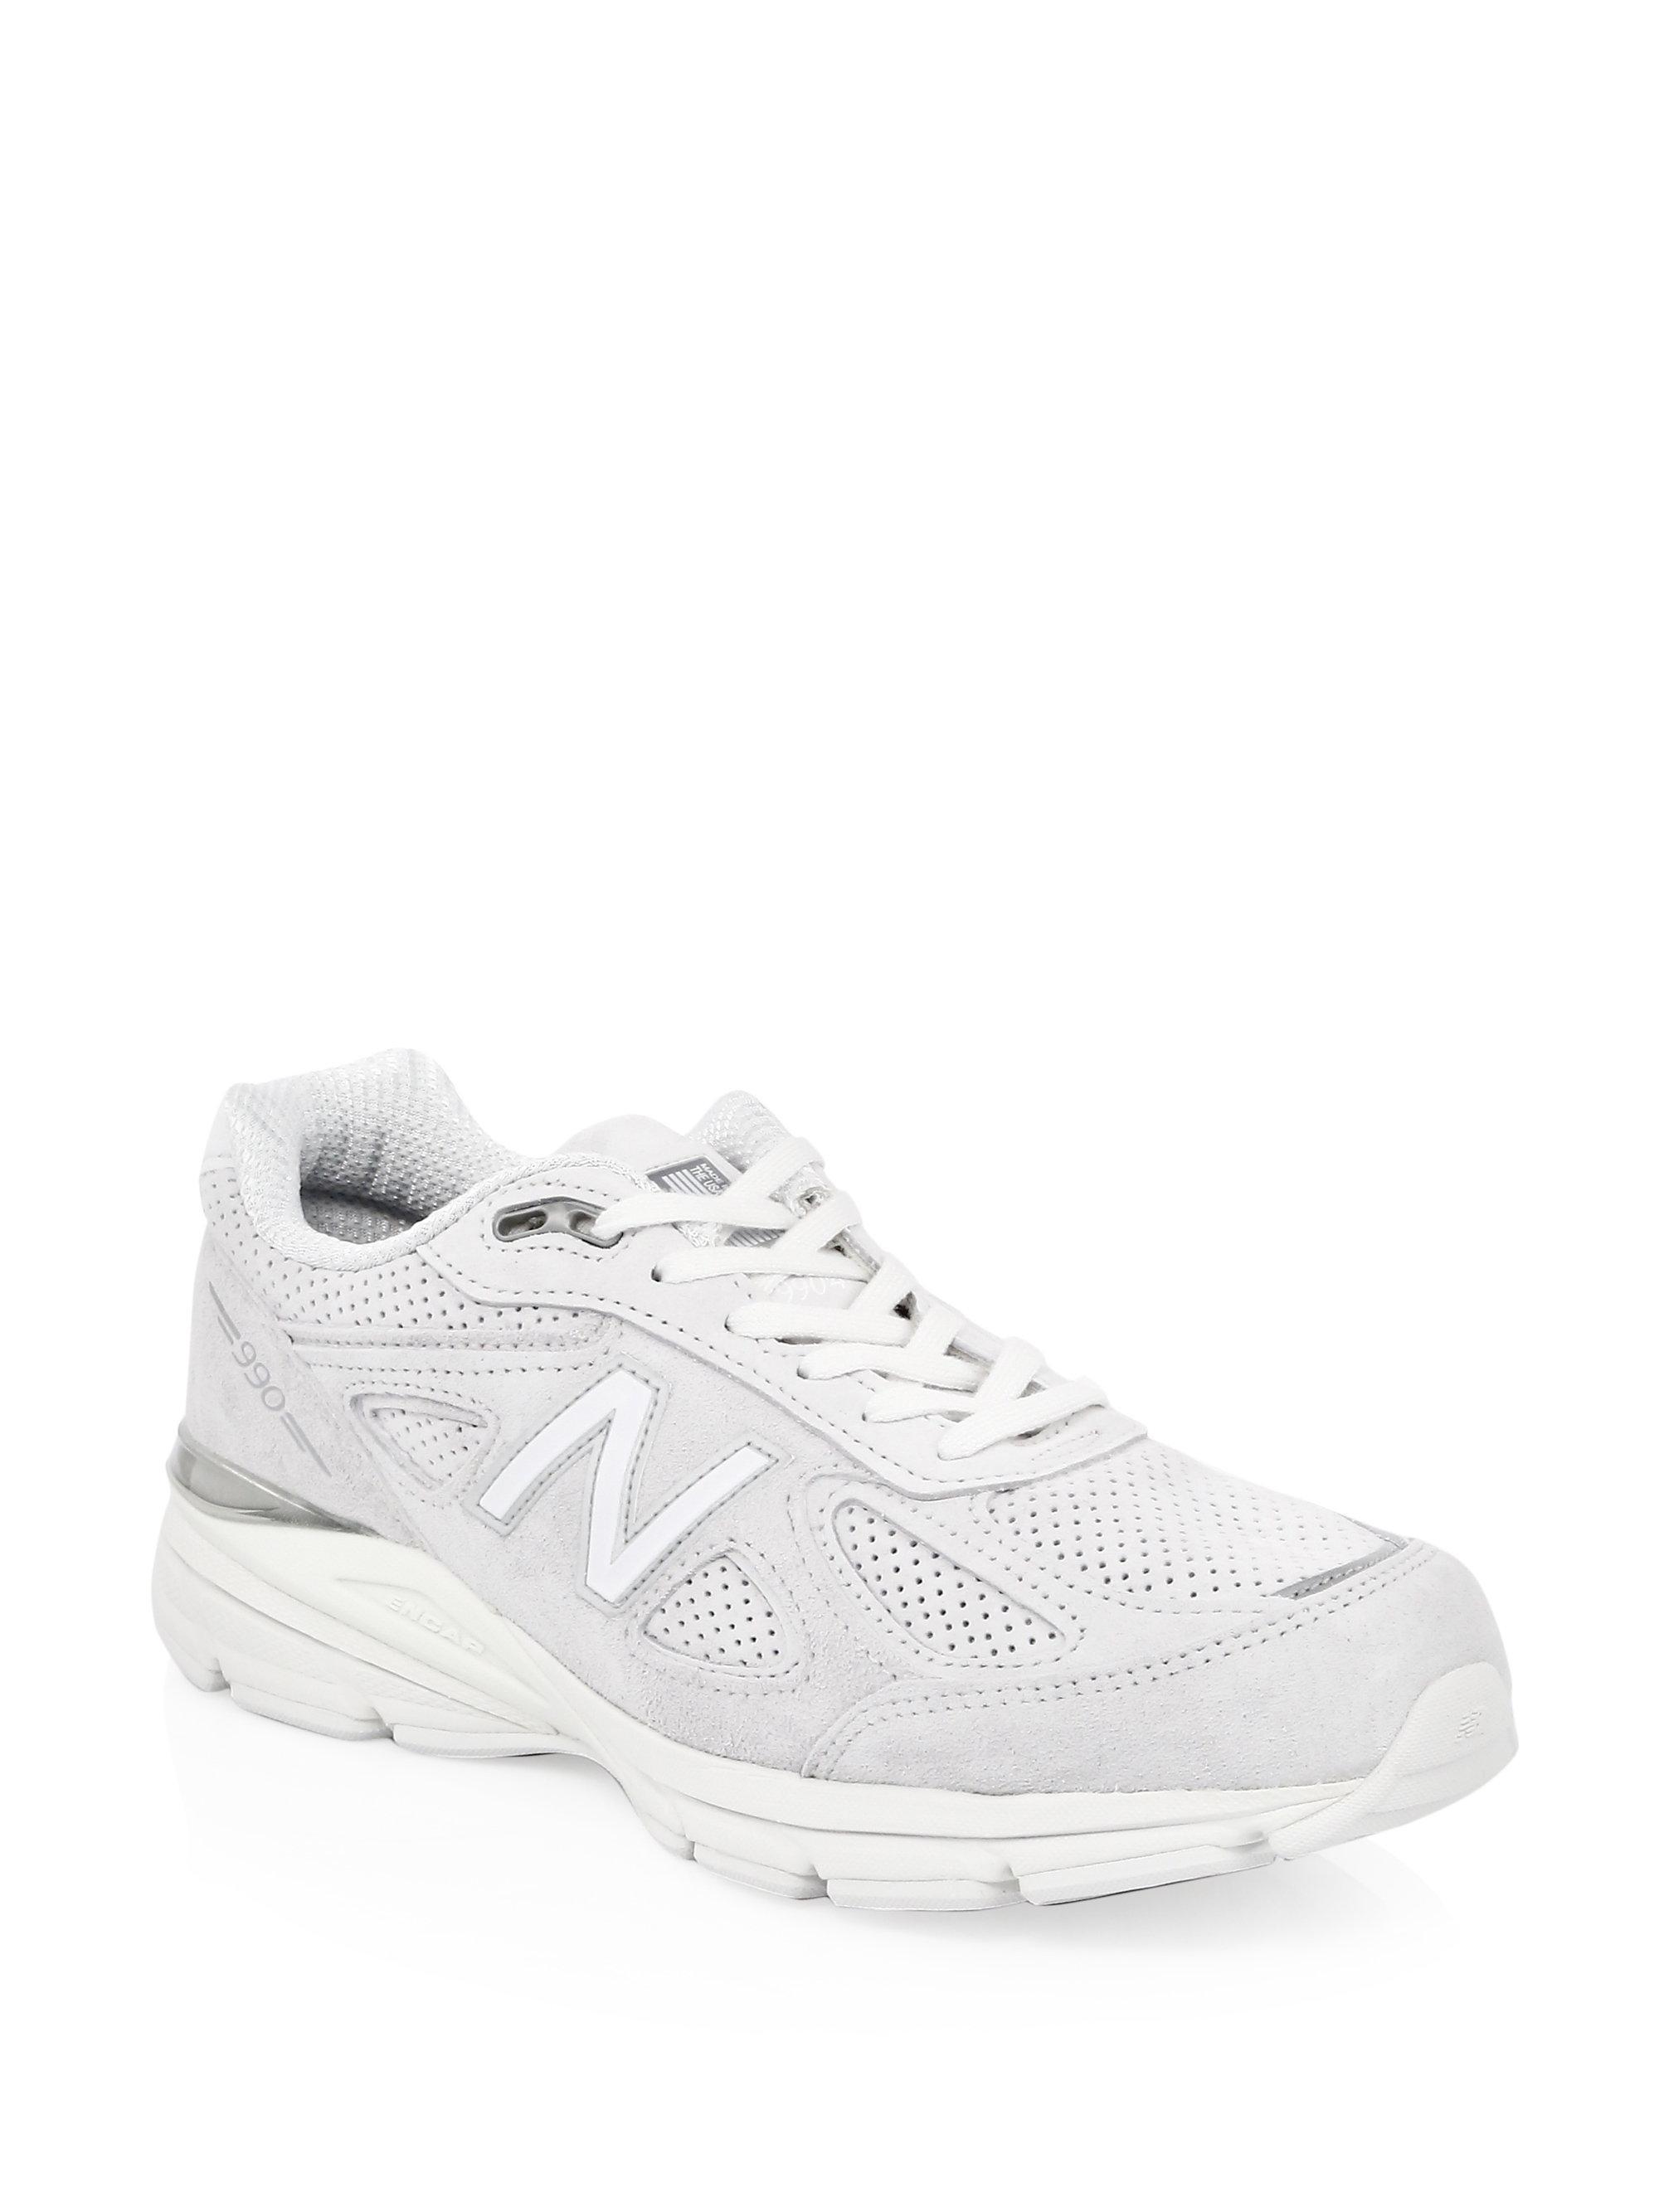 New Balance Perfrun Suede Sneakers 4Ol9gAa